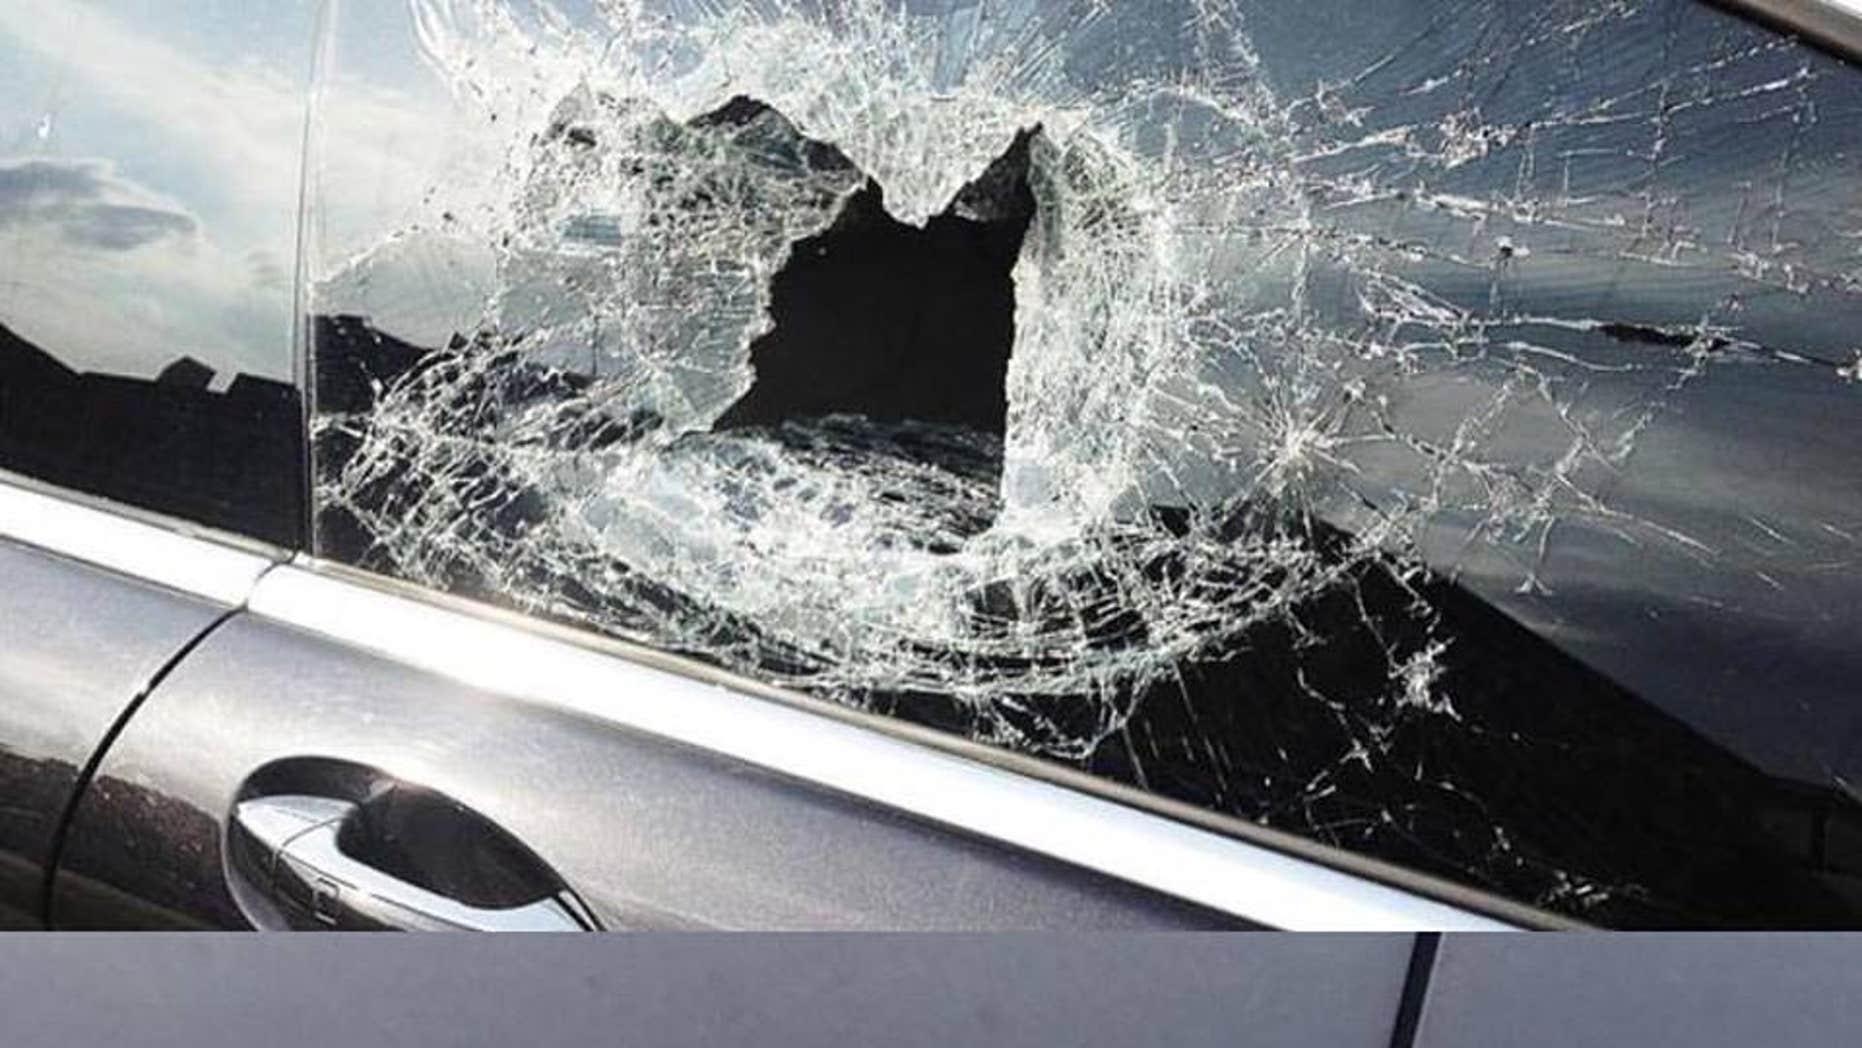 Photos of the damage.